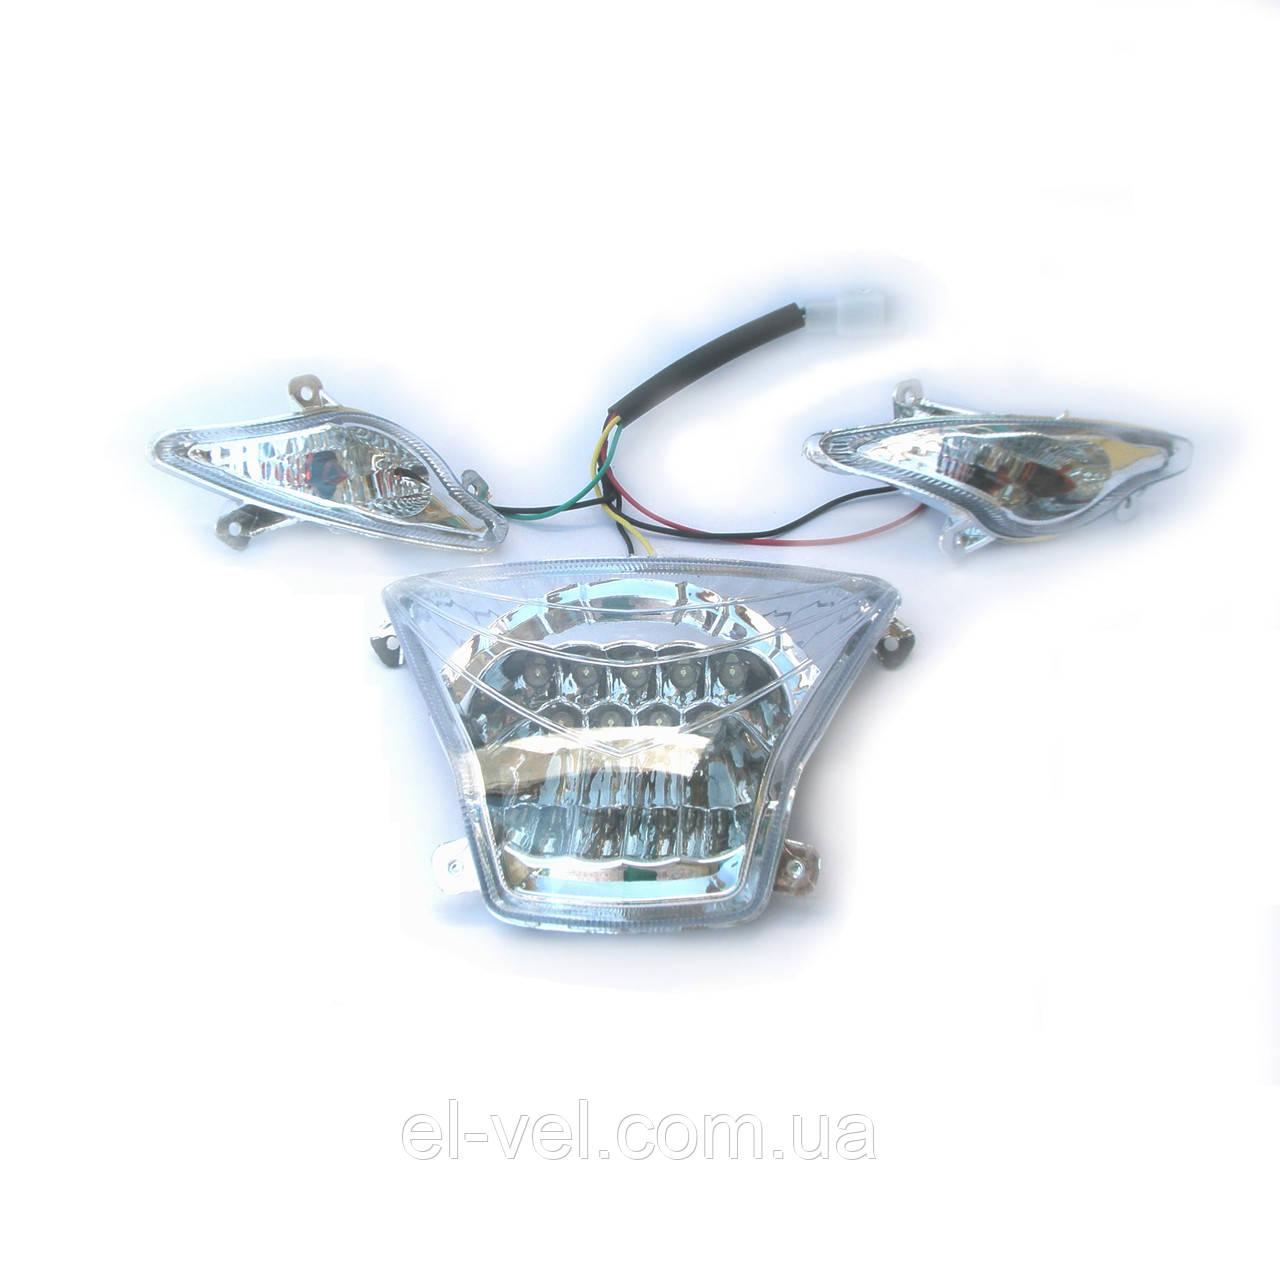 Комплект передних фар к модели электровелосипеда BL-ZZW  60V